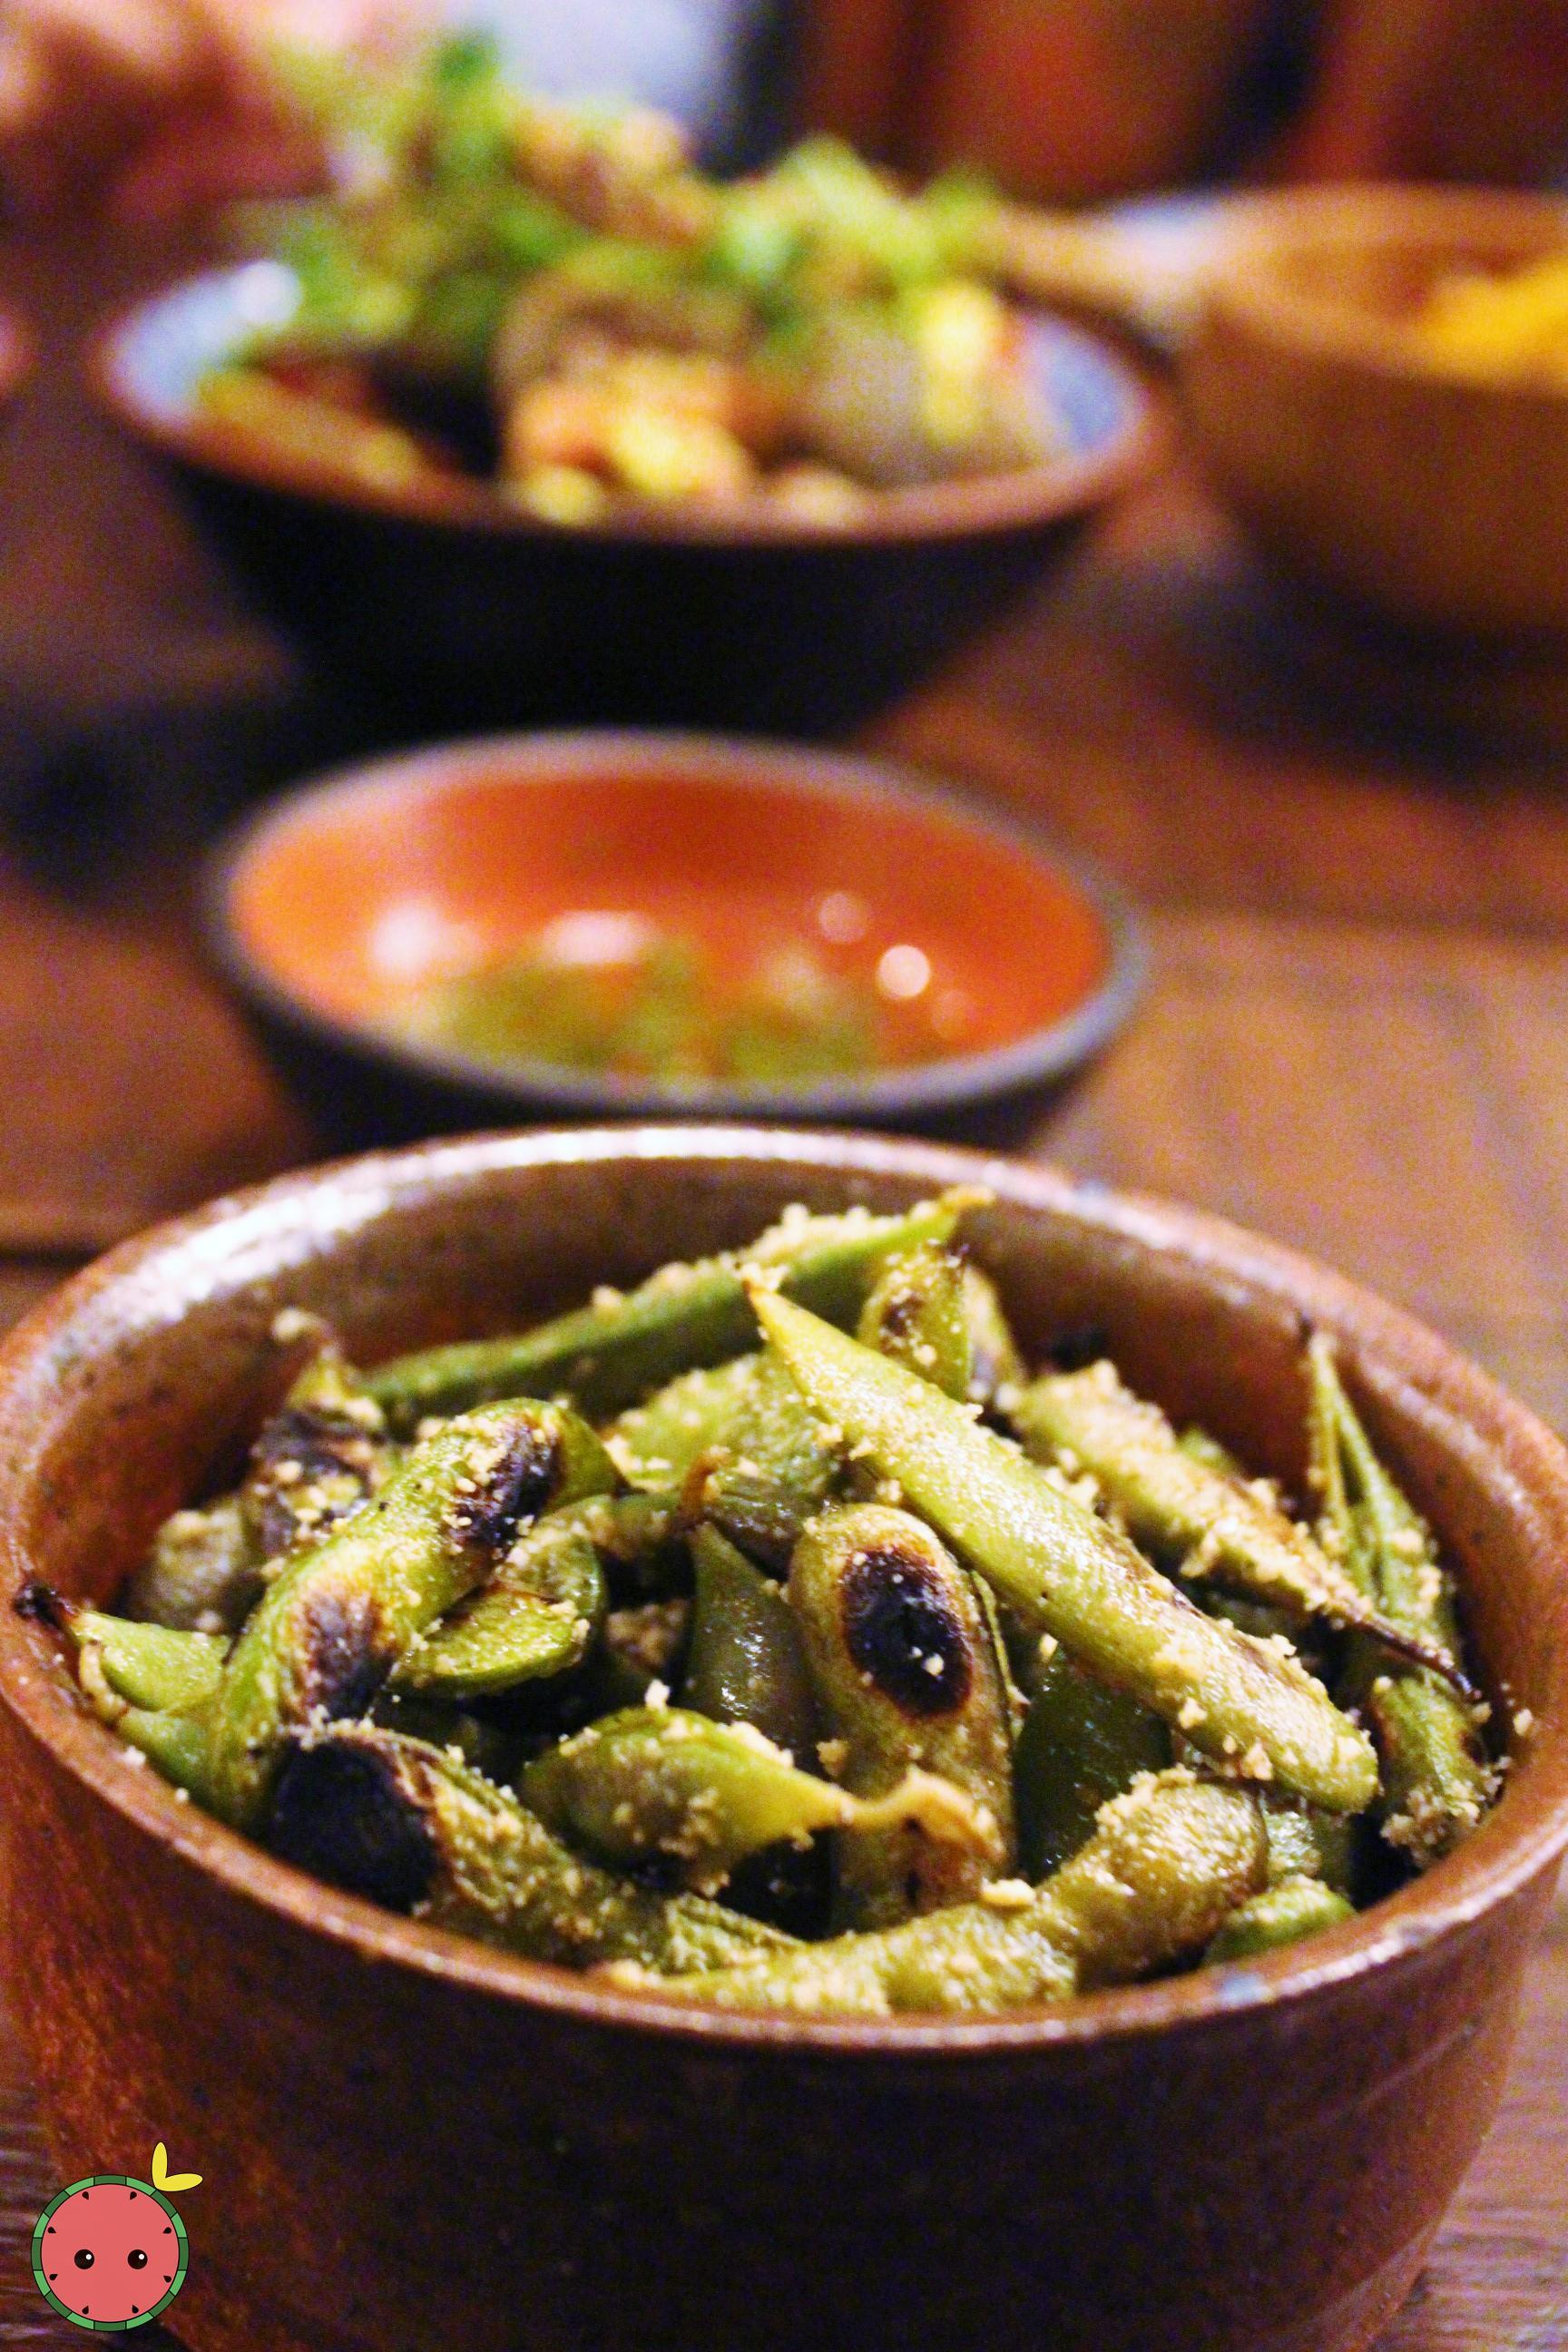 Kuro Edamame - Black edamame, charred, yuzu salt, chili